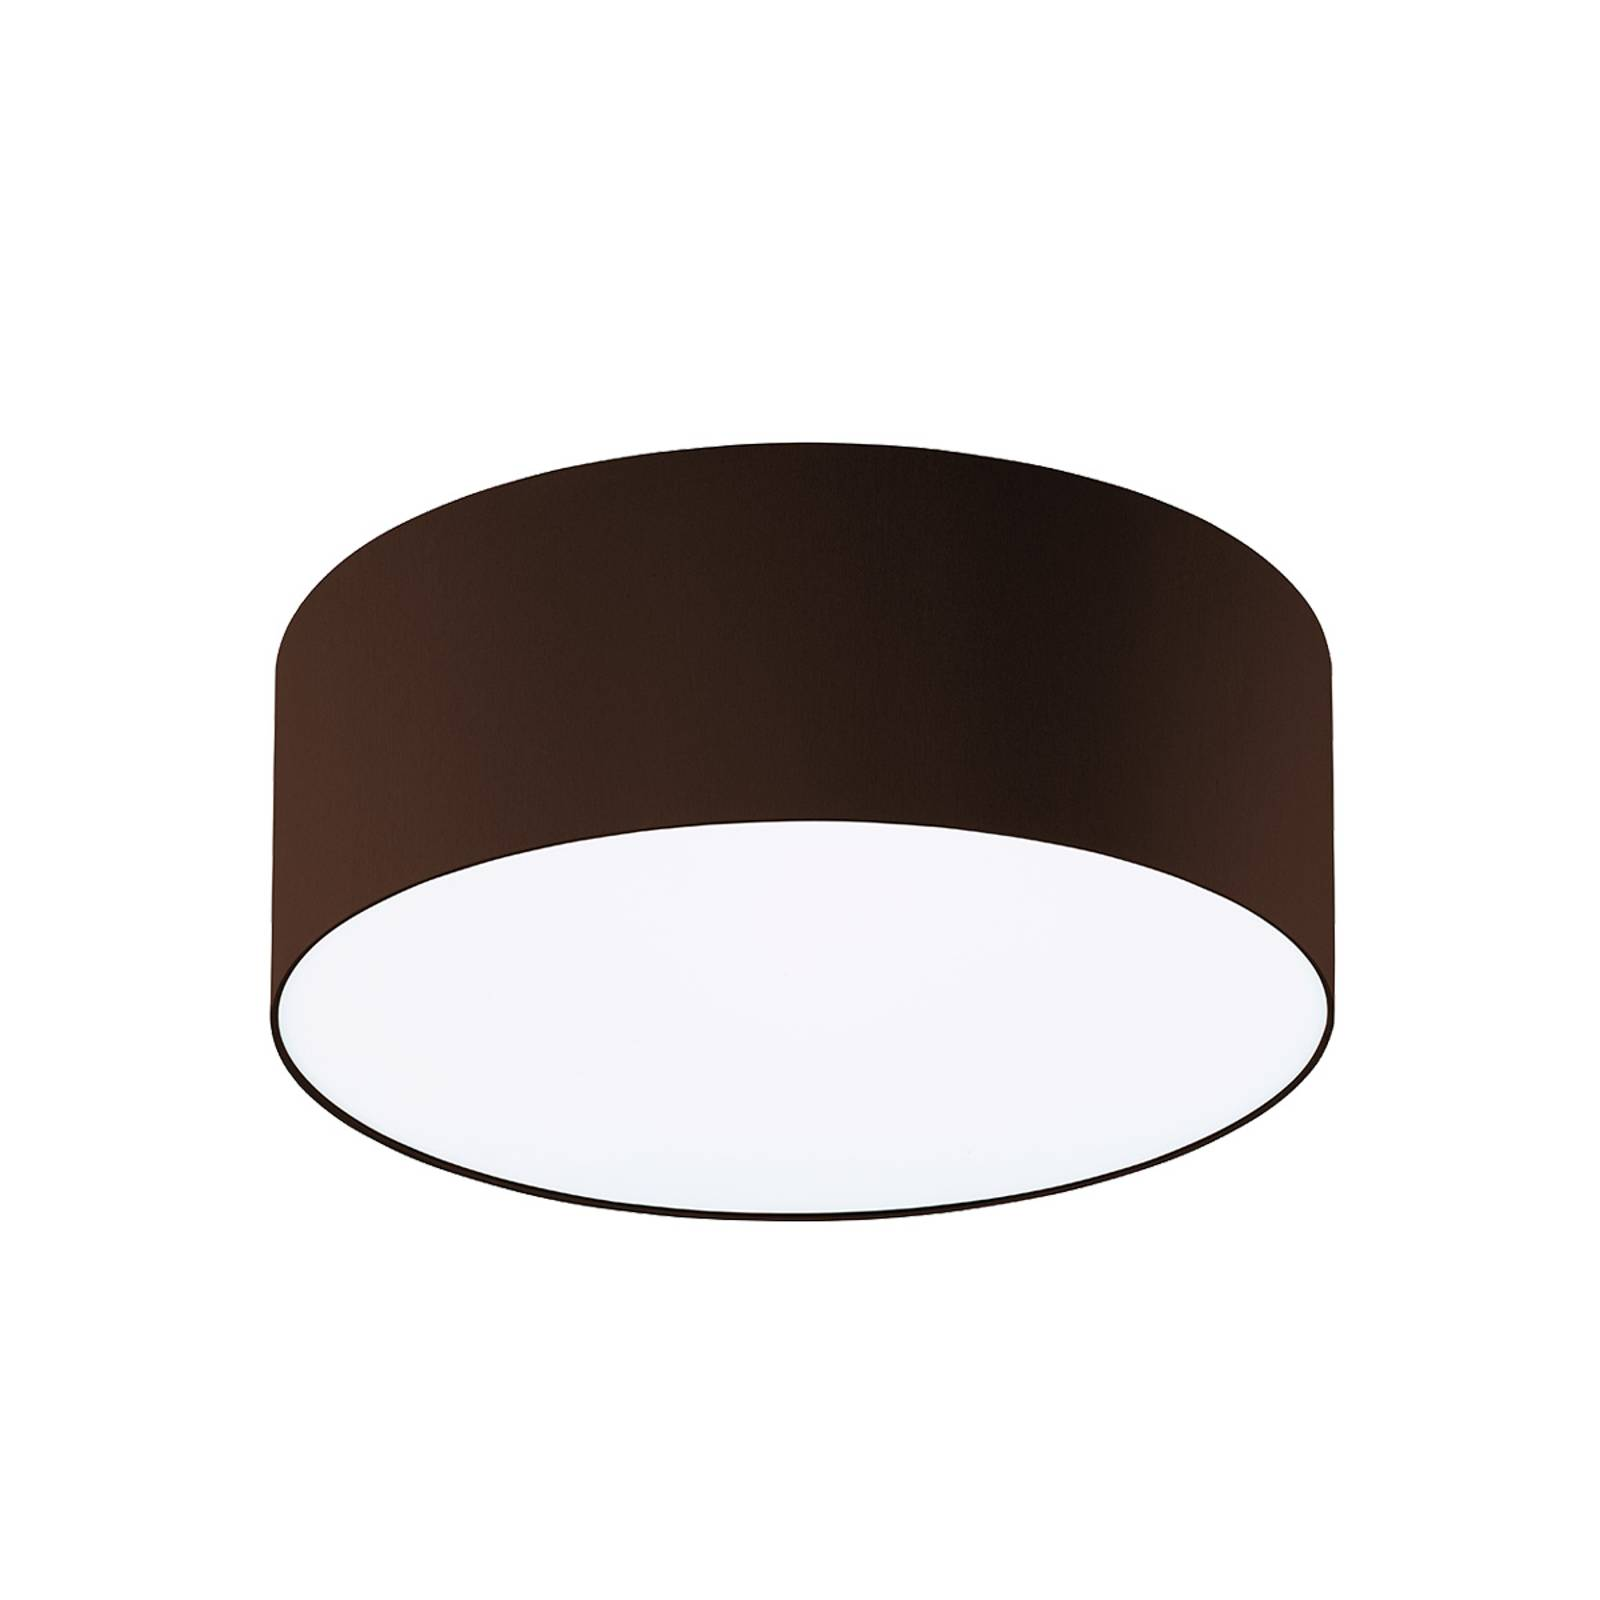 Mokkabruine plafondlamp Mara, 40 cm